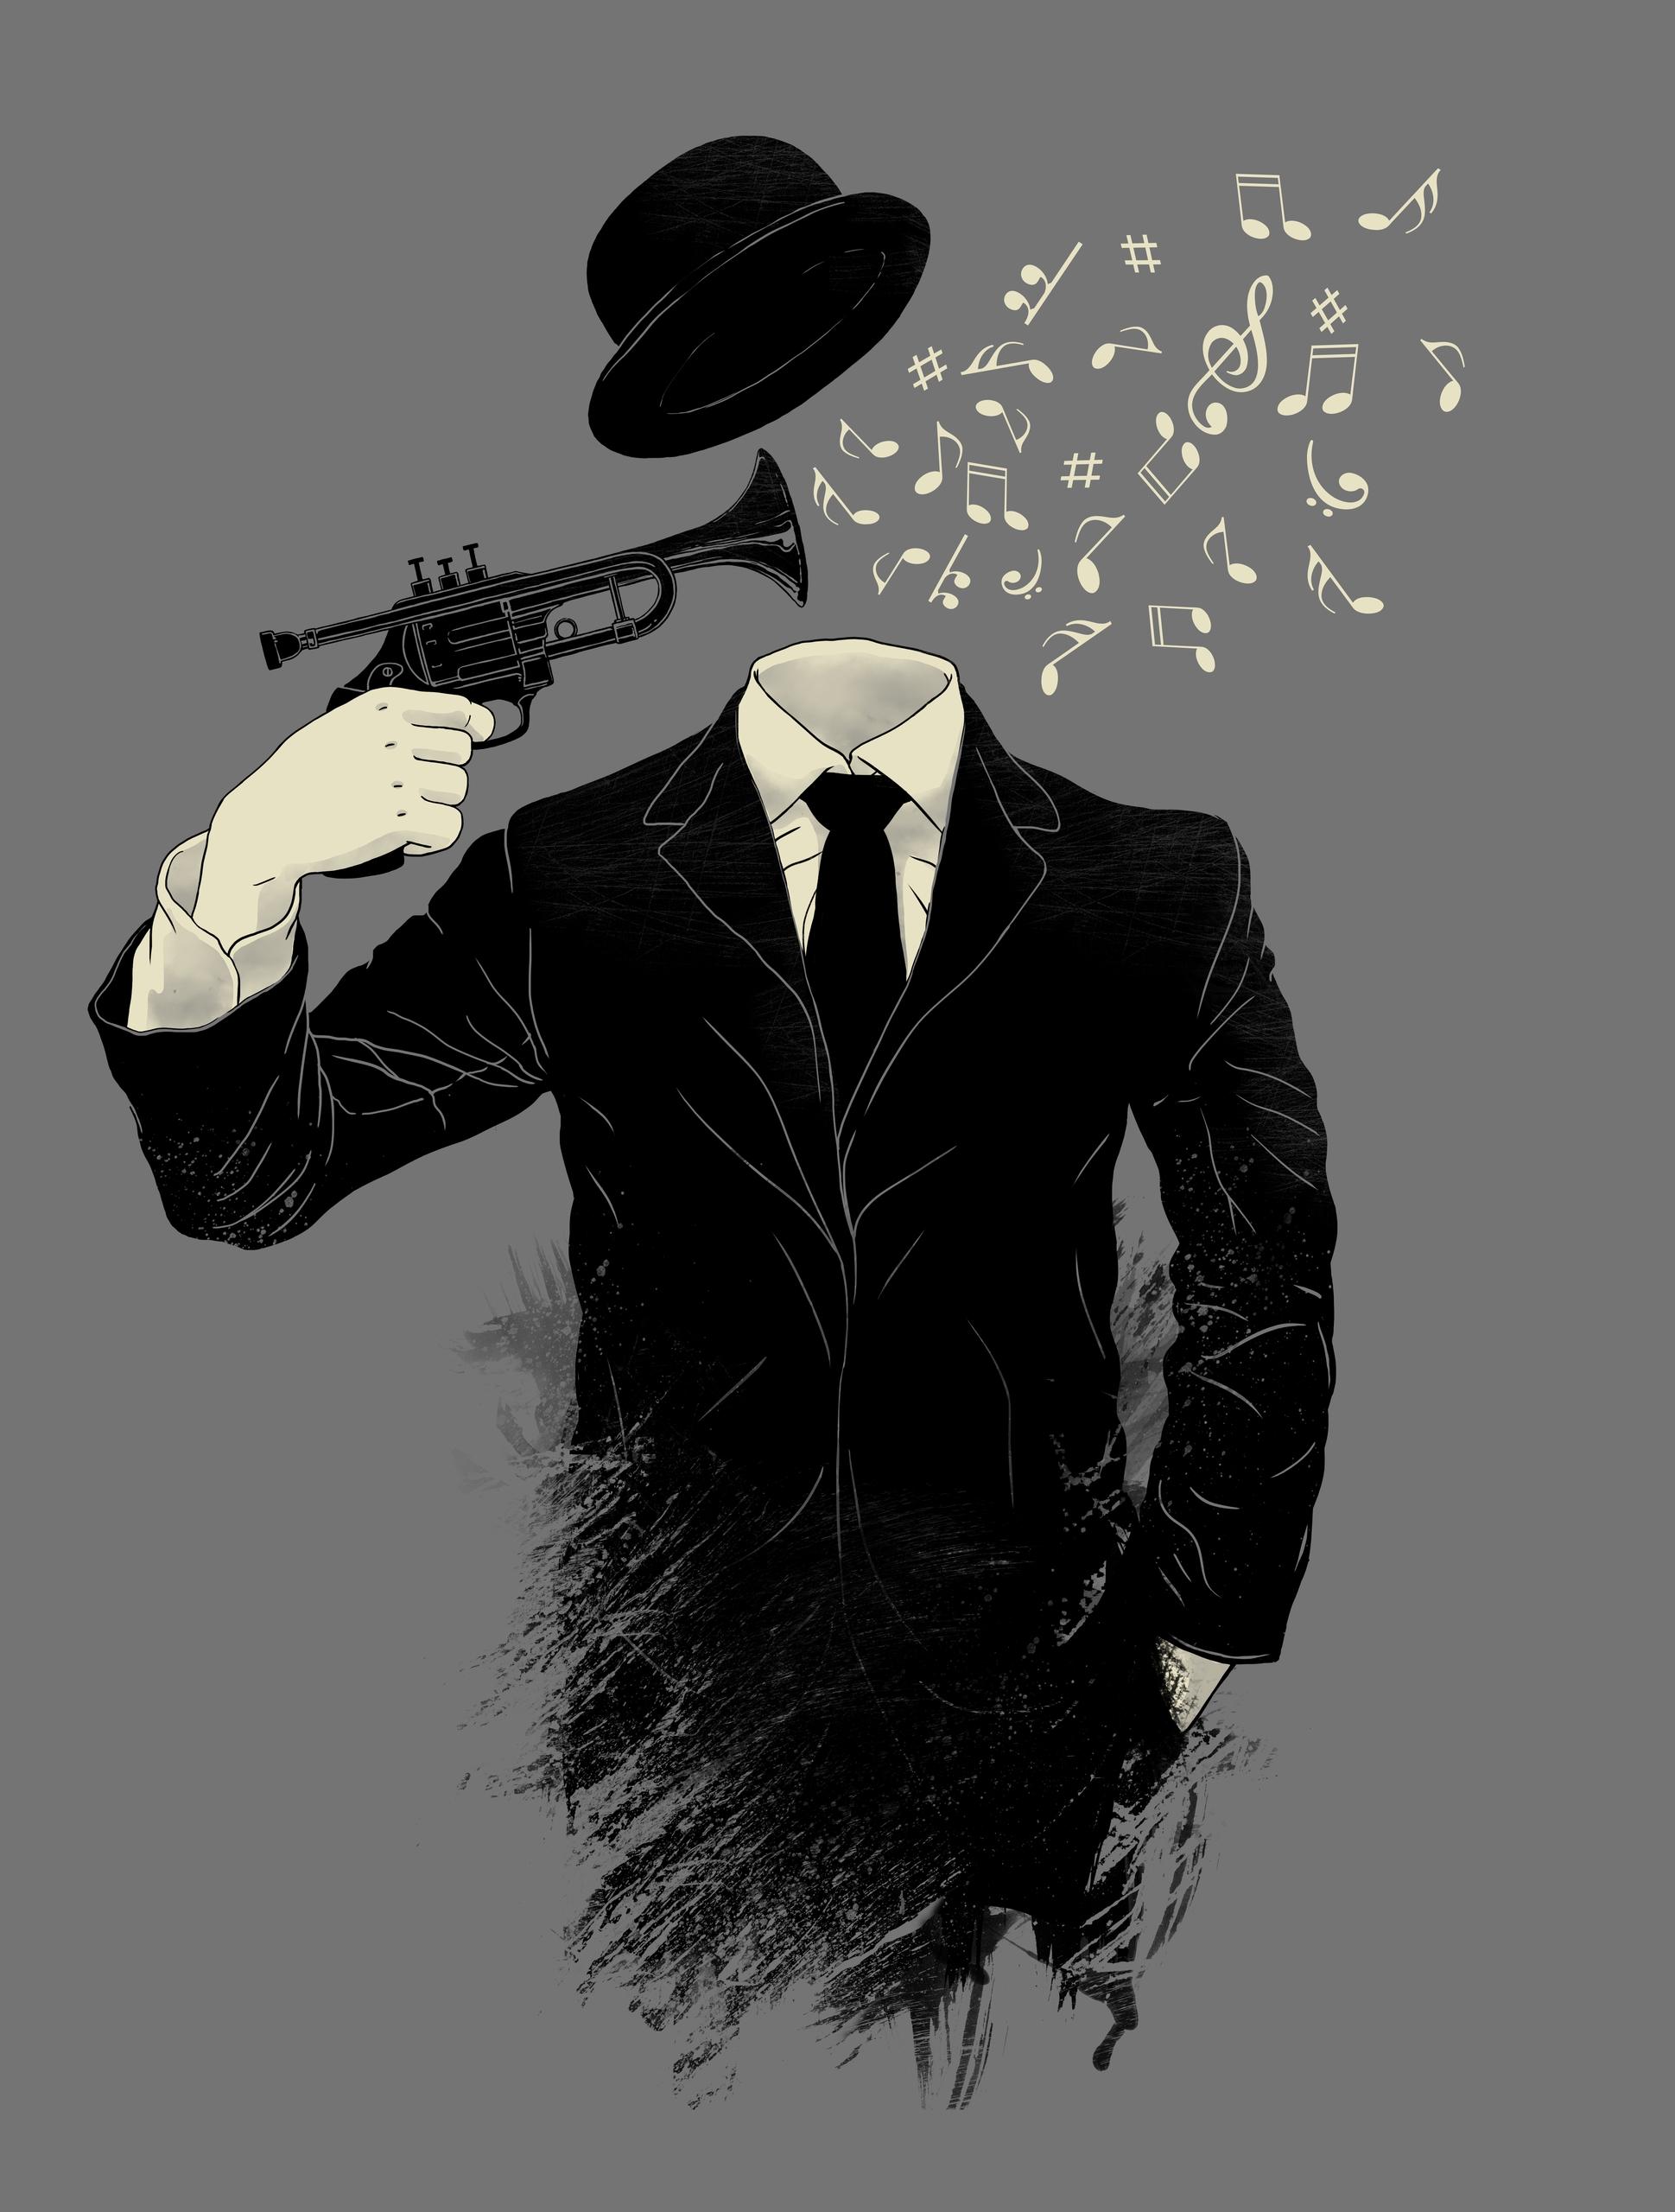 Blown - music, trumpet, gun, musicalnotes - angrymonk | ello